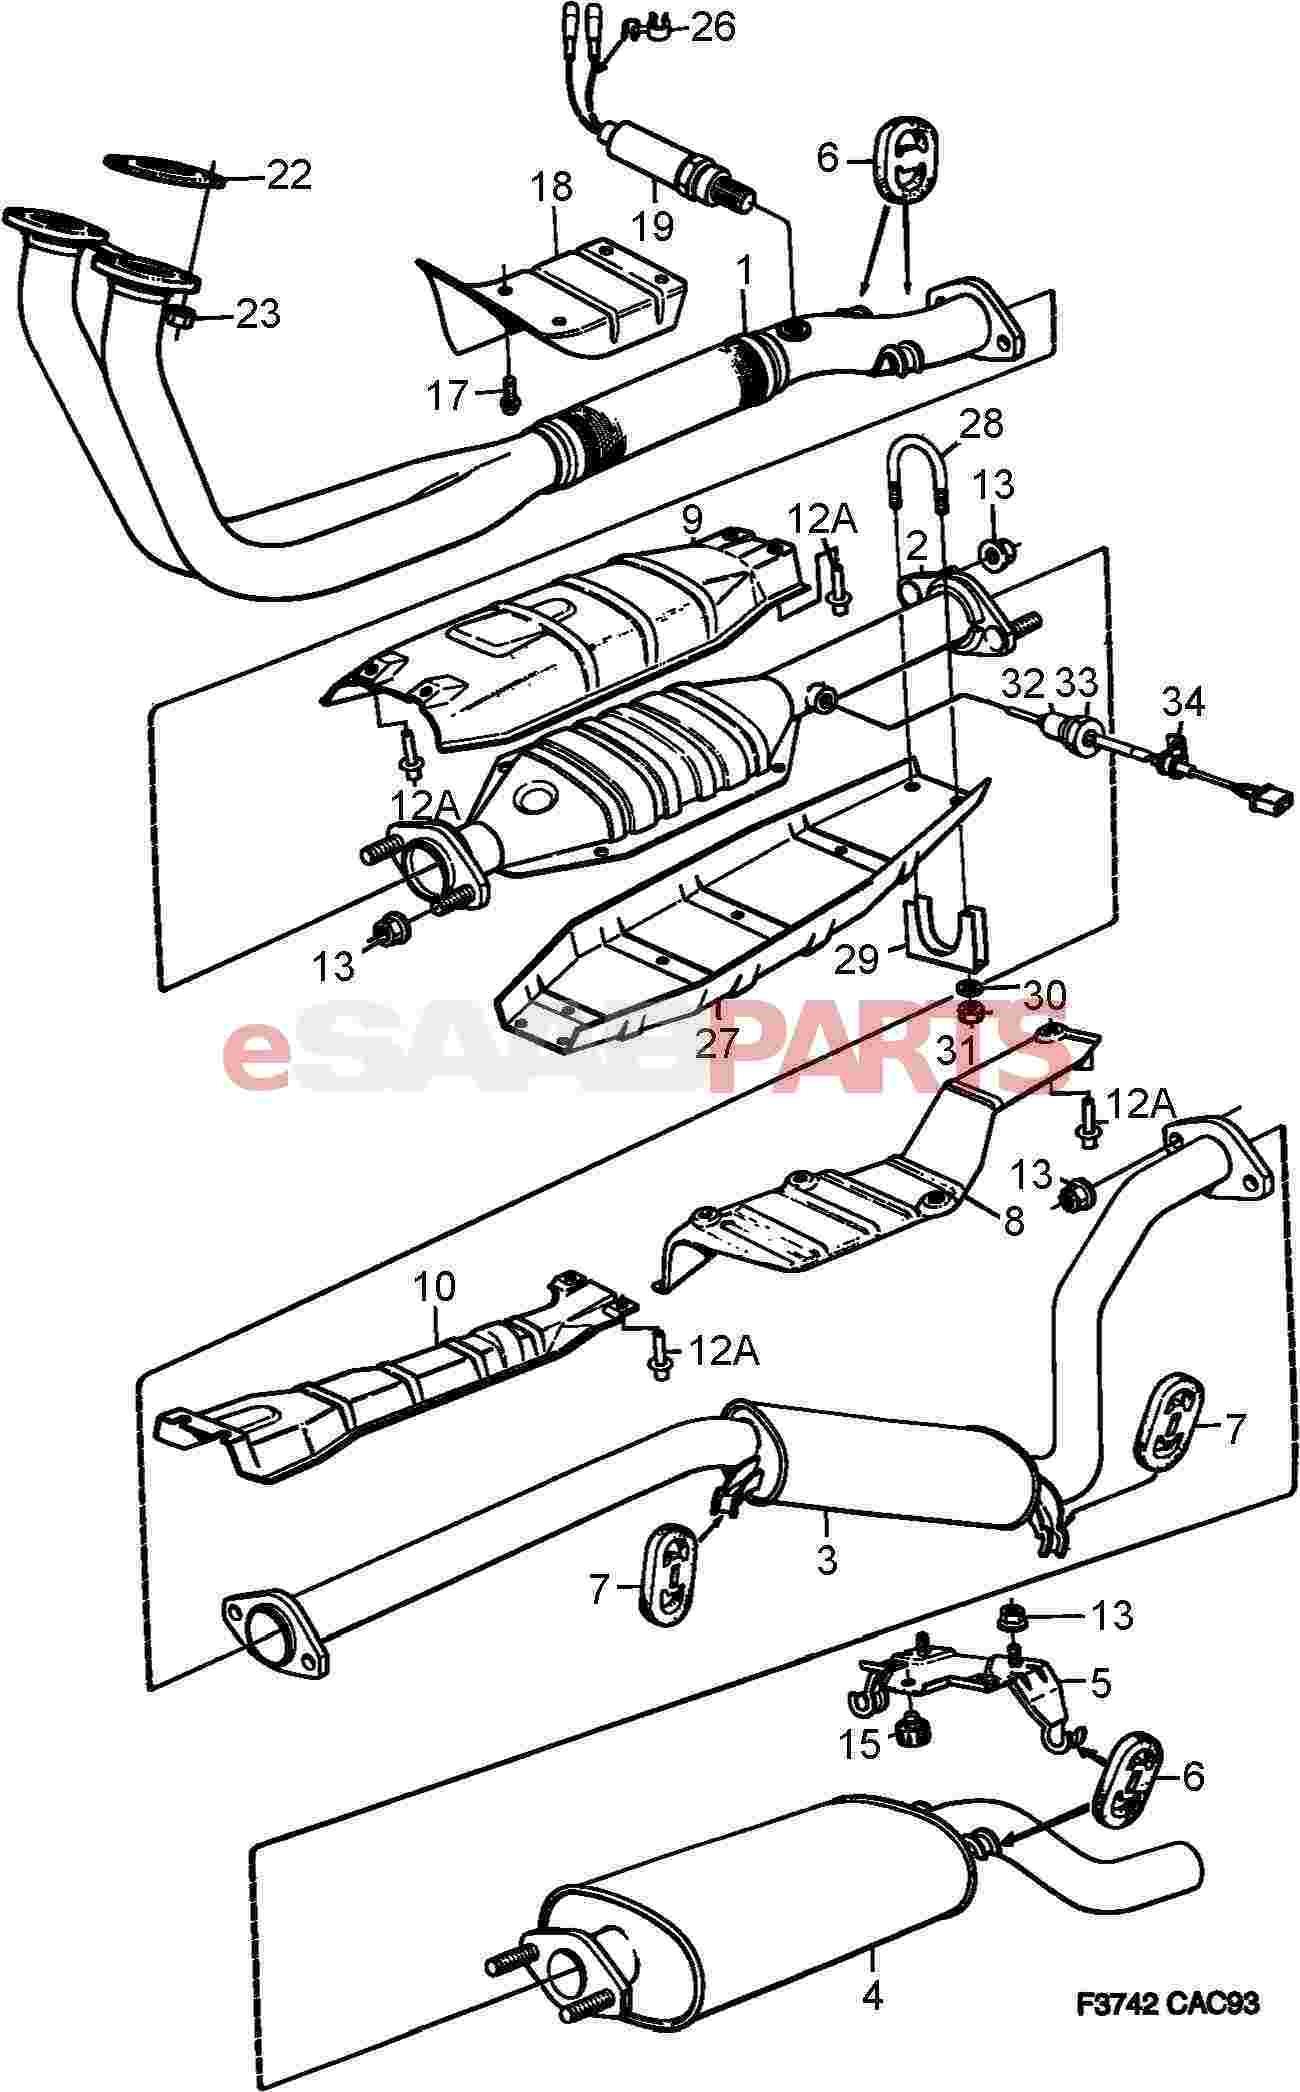 hight resolution of saab exhaust diagram wiring diagram go saab 9 5 towbar wiring diagram saab 95 wiring diagram